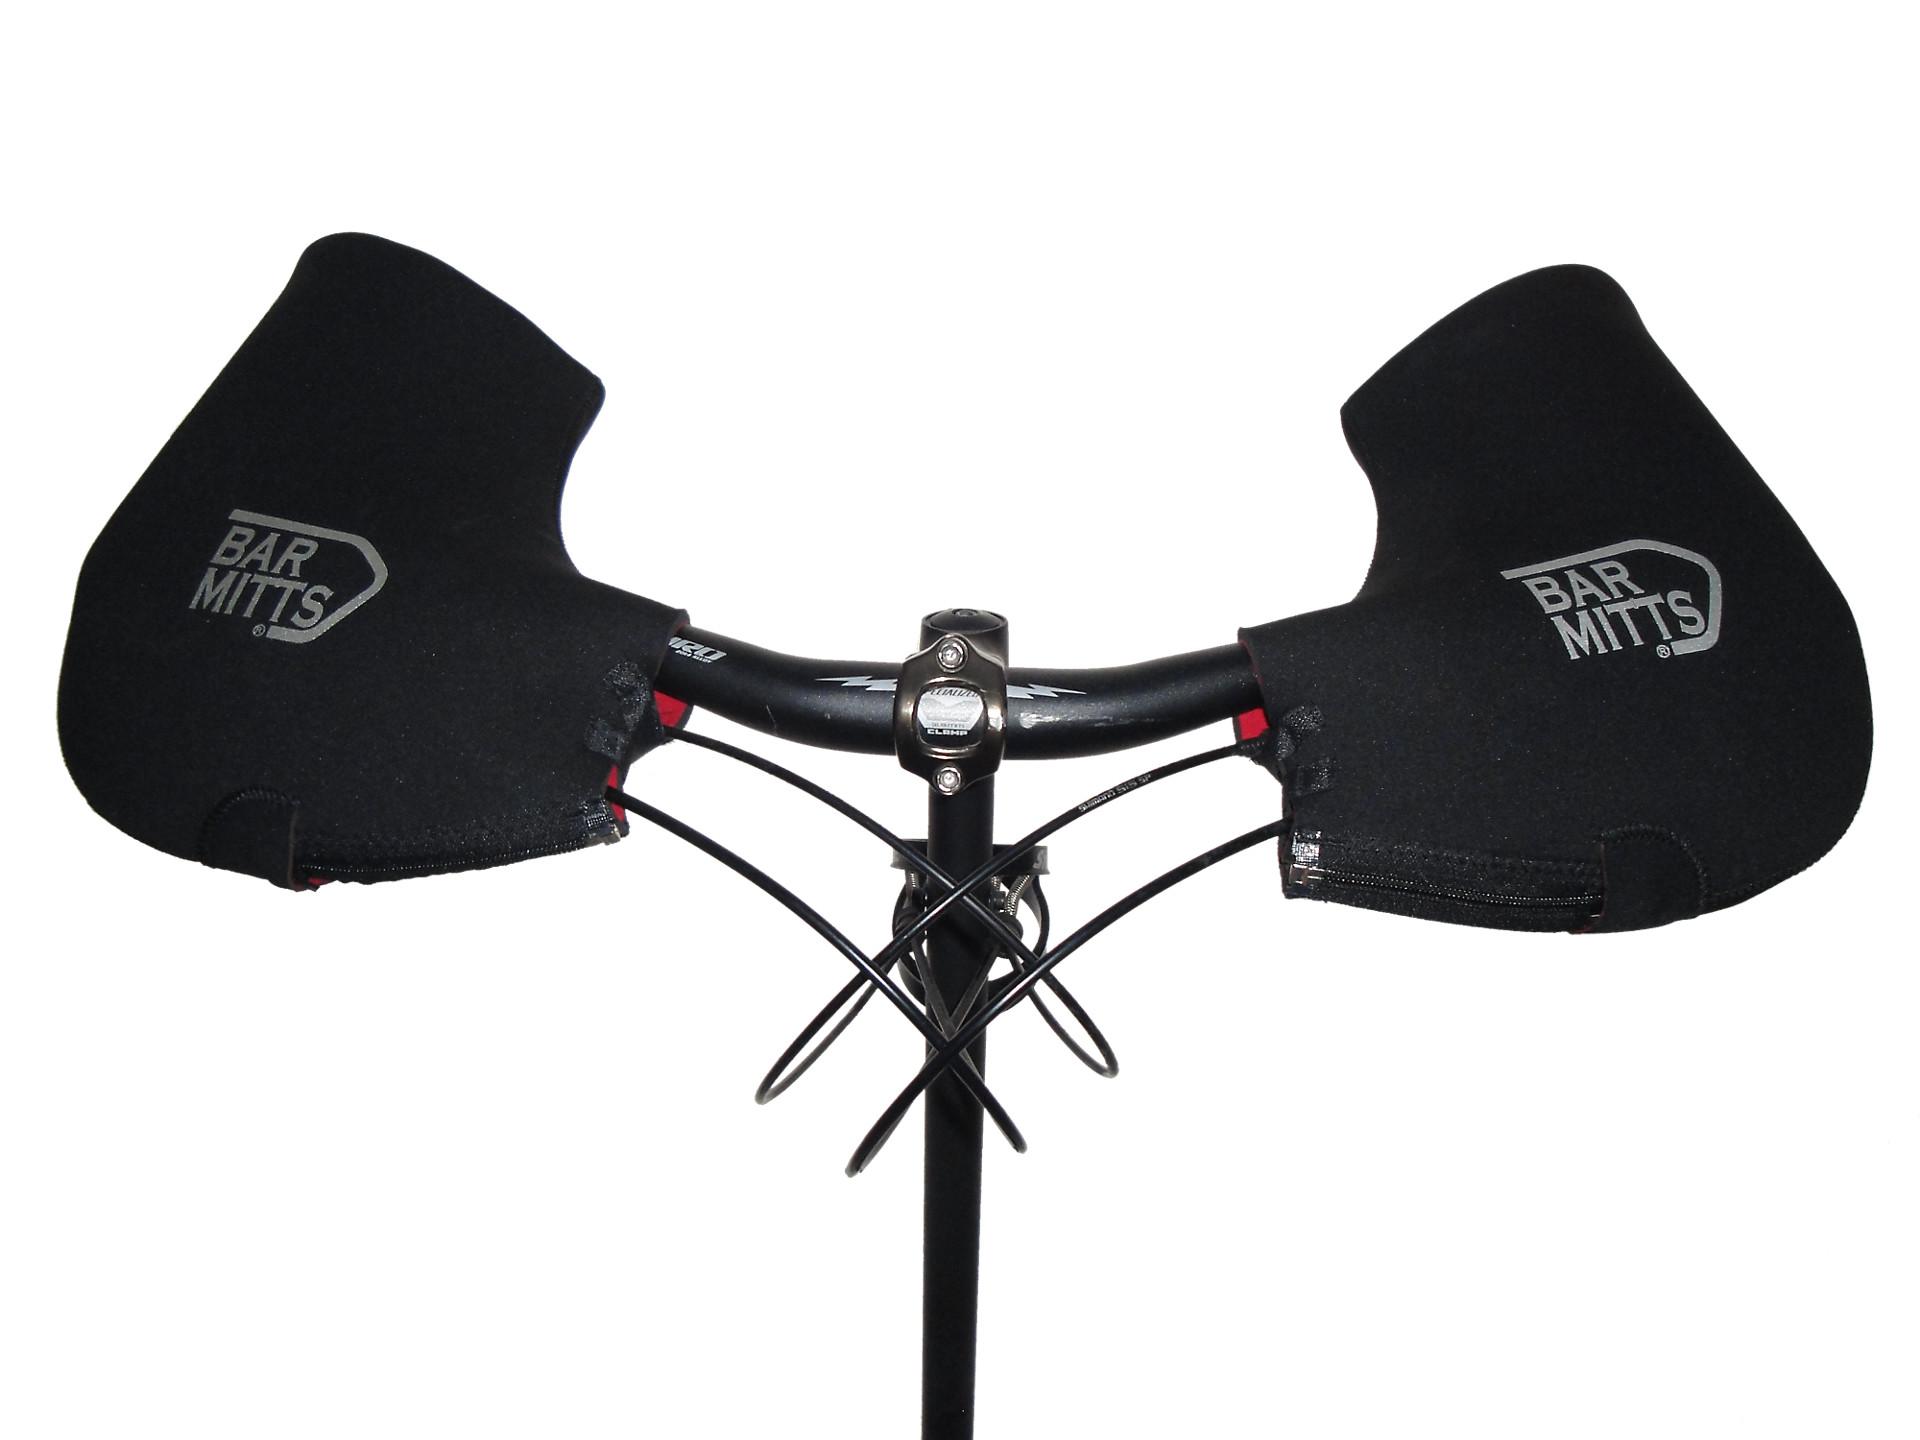 Extra Large Bar Mitts MTB Hybrid Fat Bike Winter Mitten Handlebar Covers XL